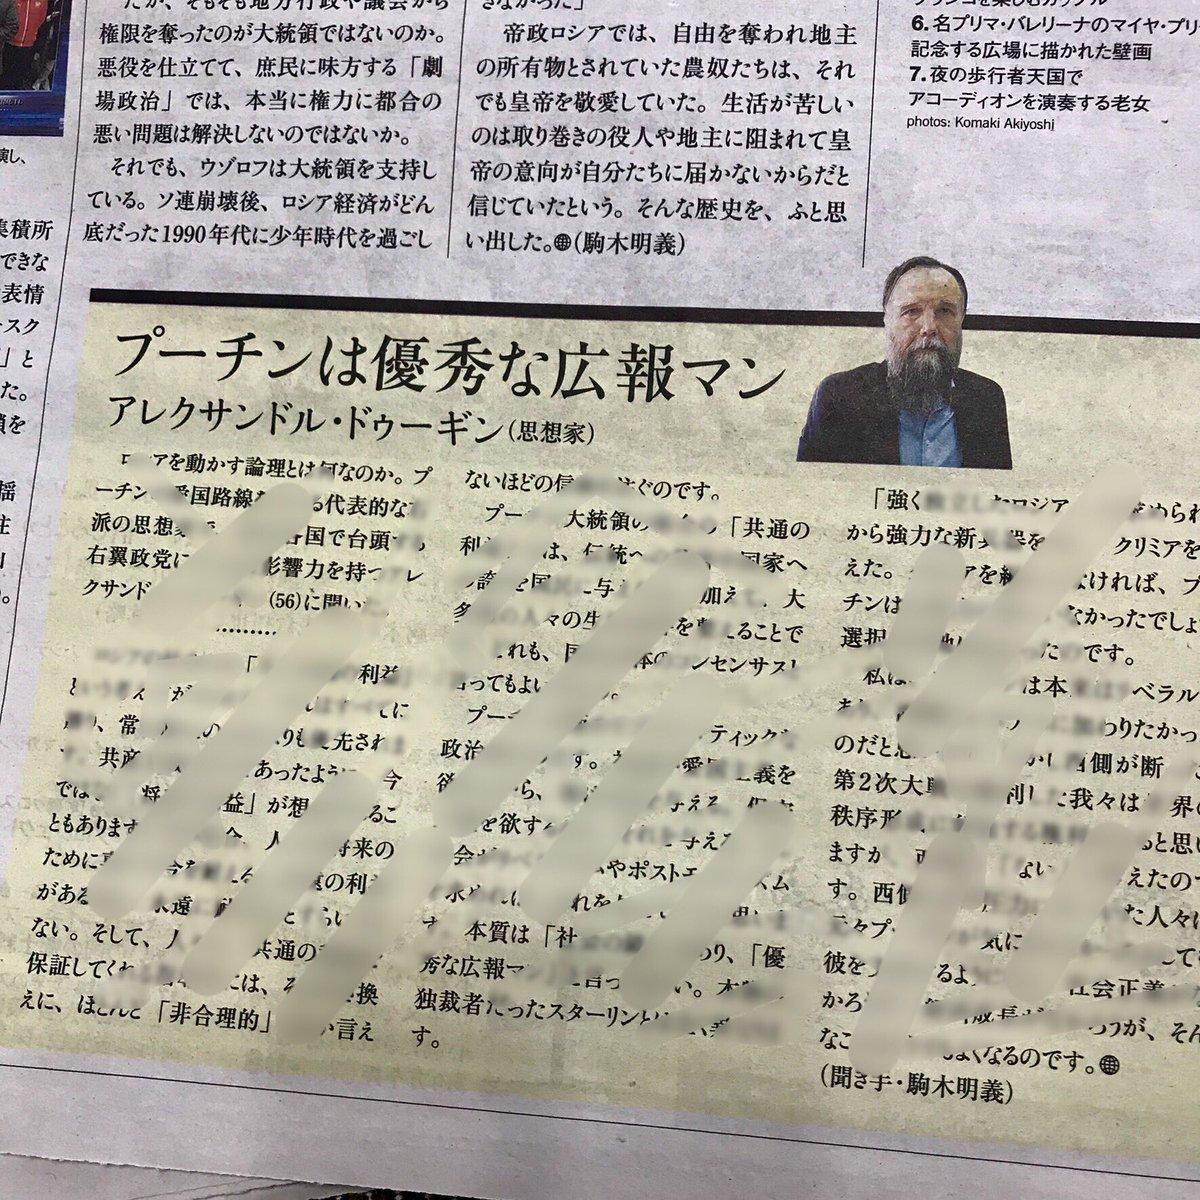 Akiyoshi Komaki 駒木明義 on Tw...